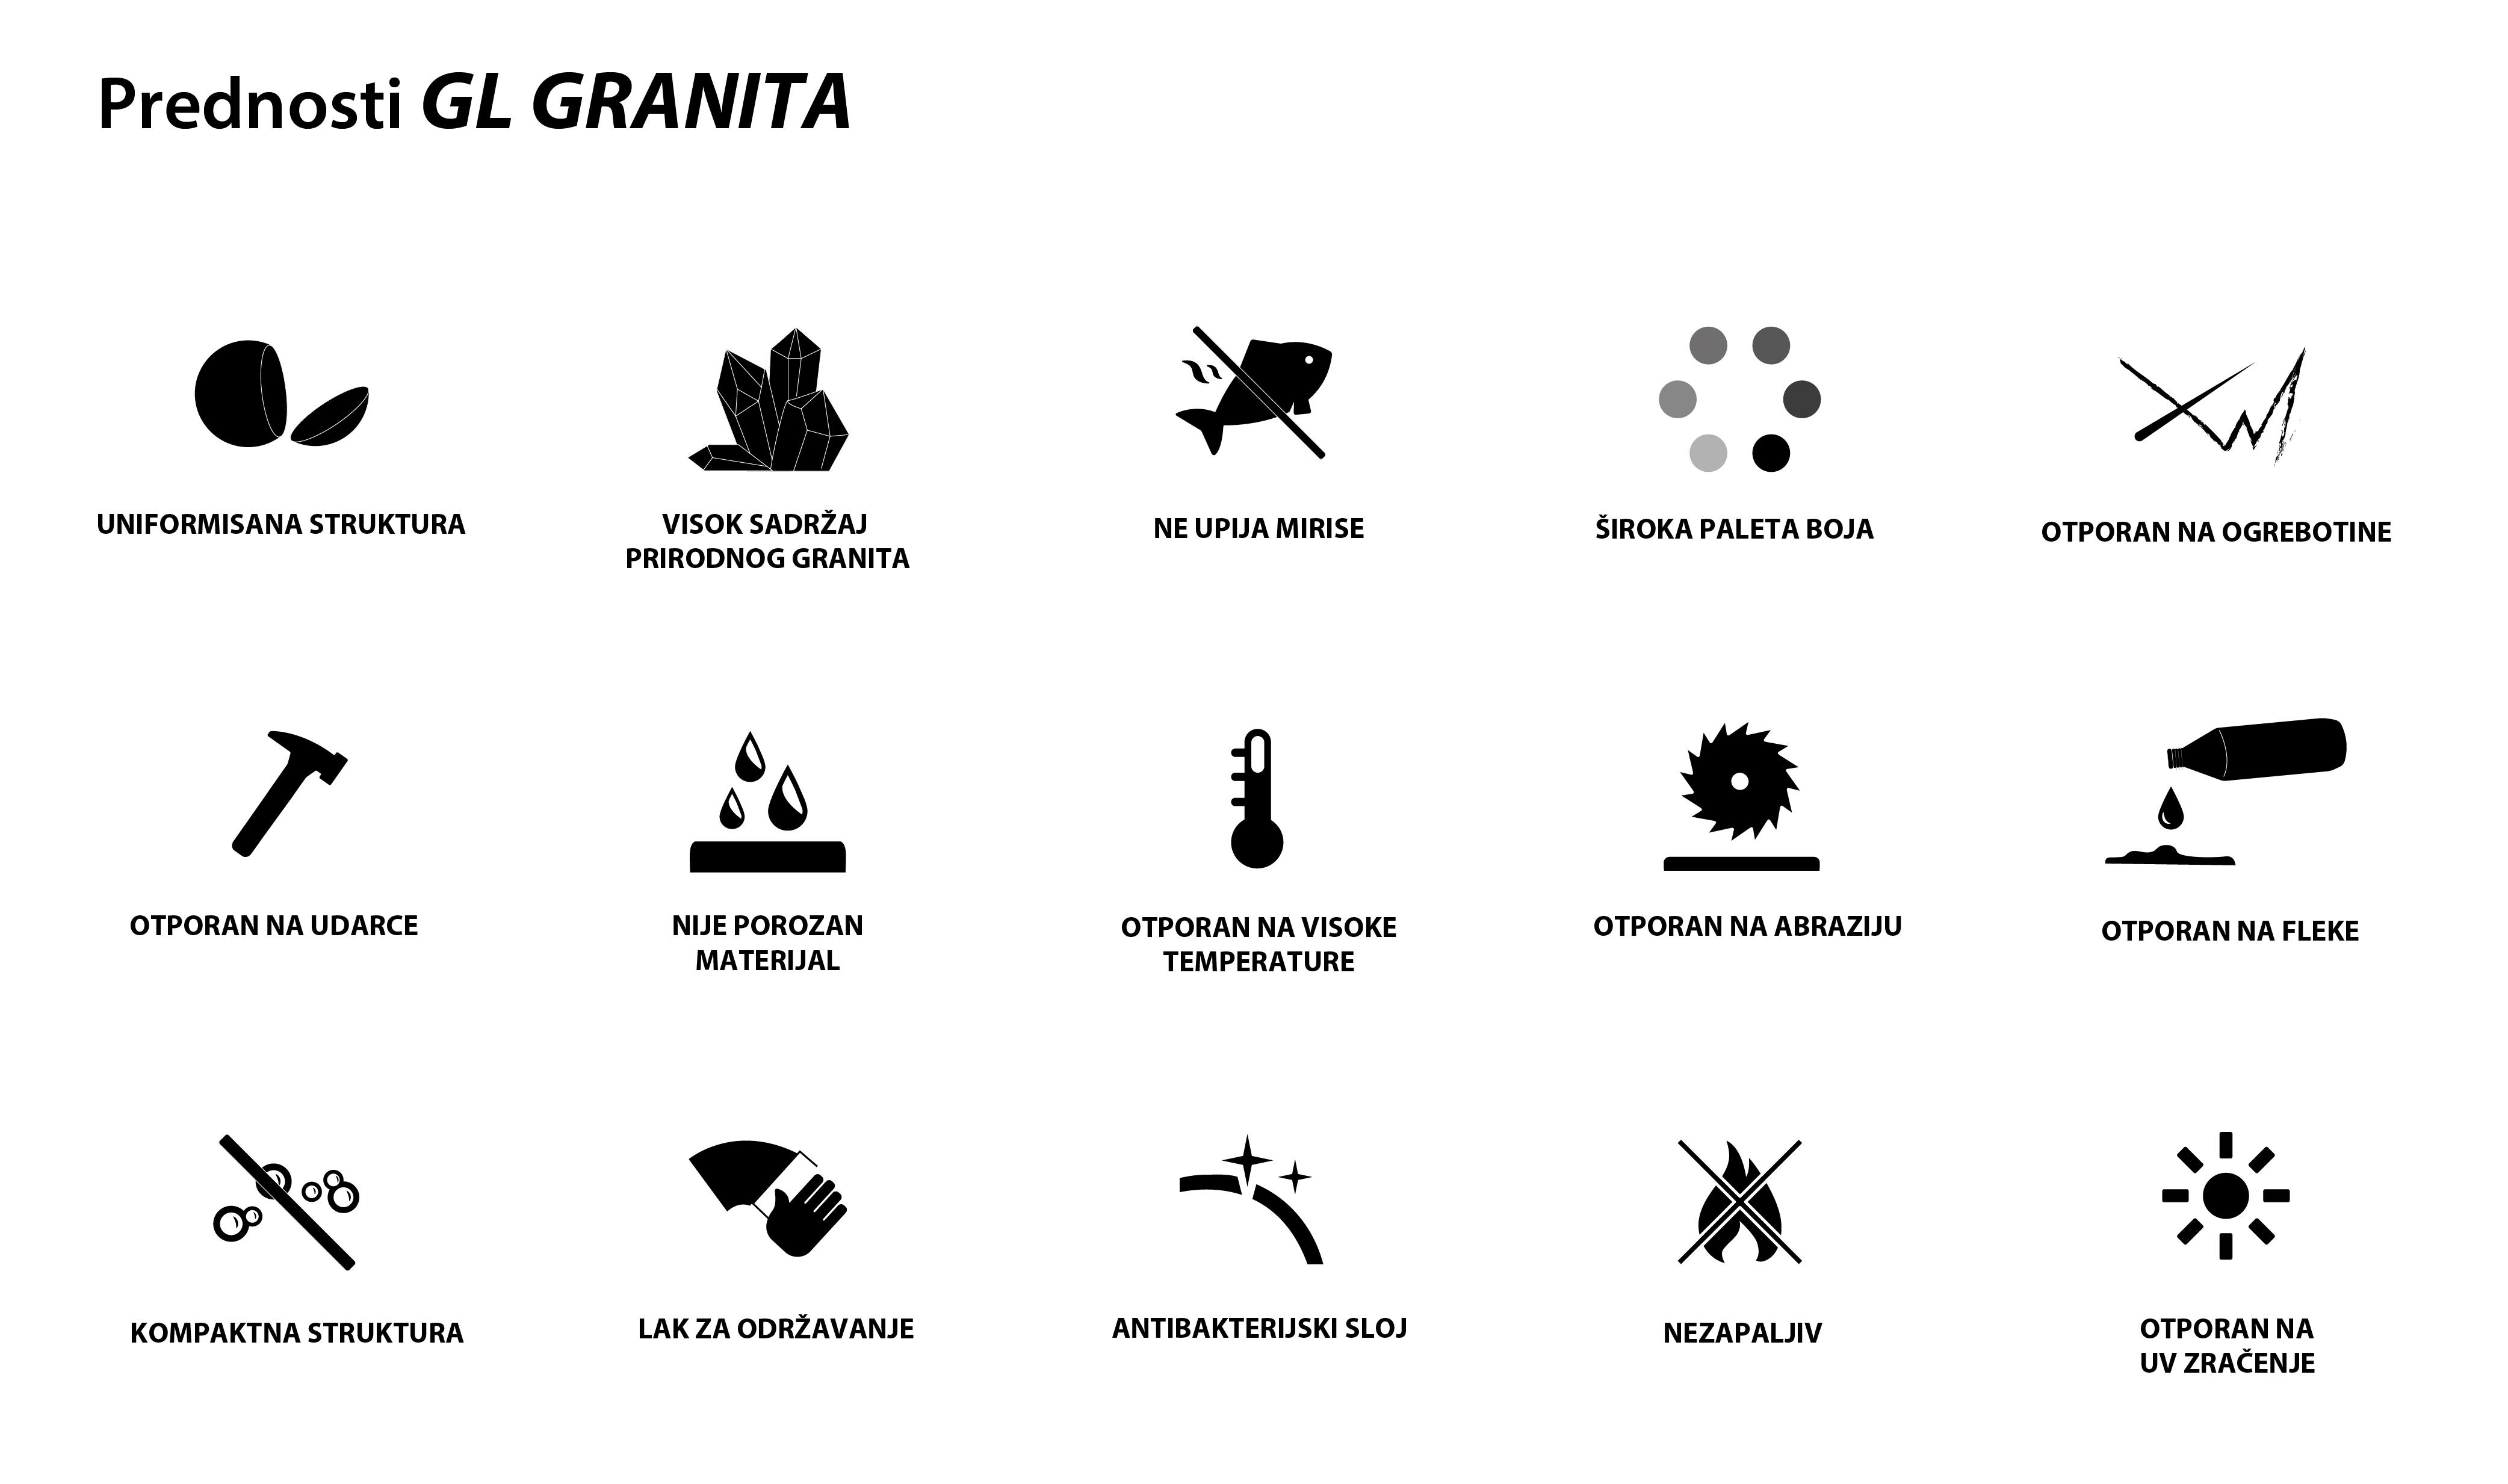 Prednosti GL GRANITA